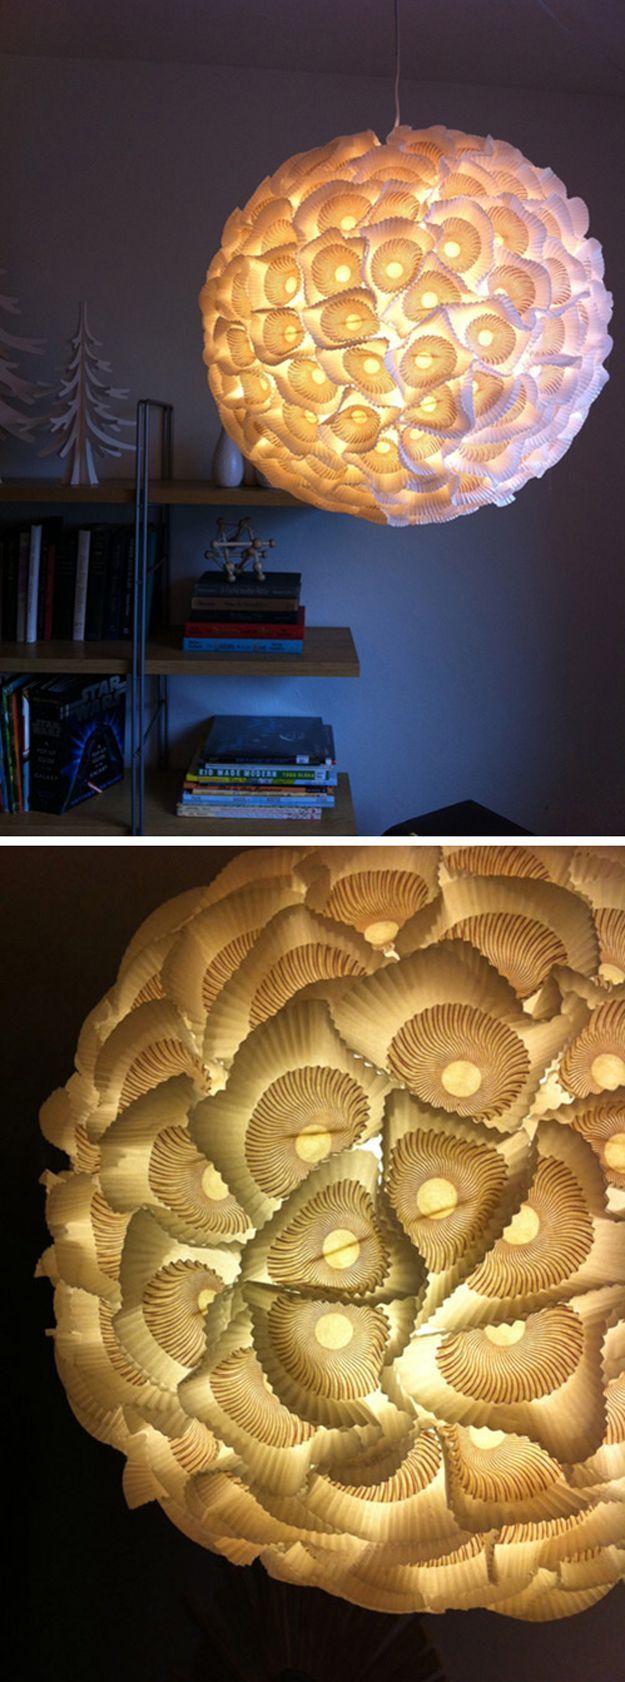 Sculptural Paper Orb Lights   Anthropologie Home Decor Hacks by DIY Ready at http://diyready.com/diy-decor-anthropologie-hacks/